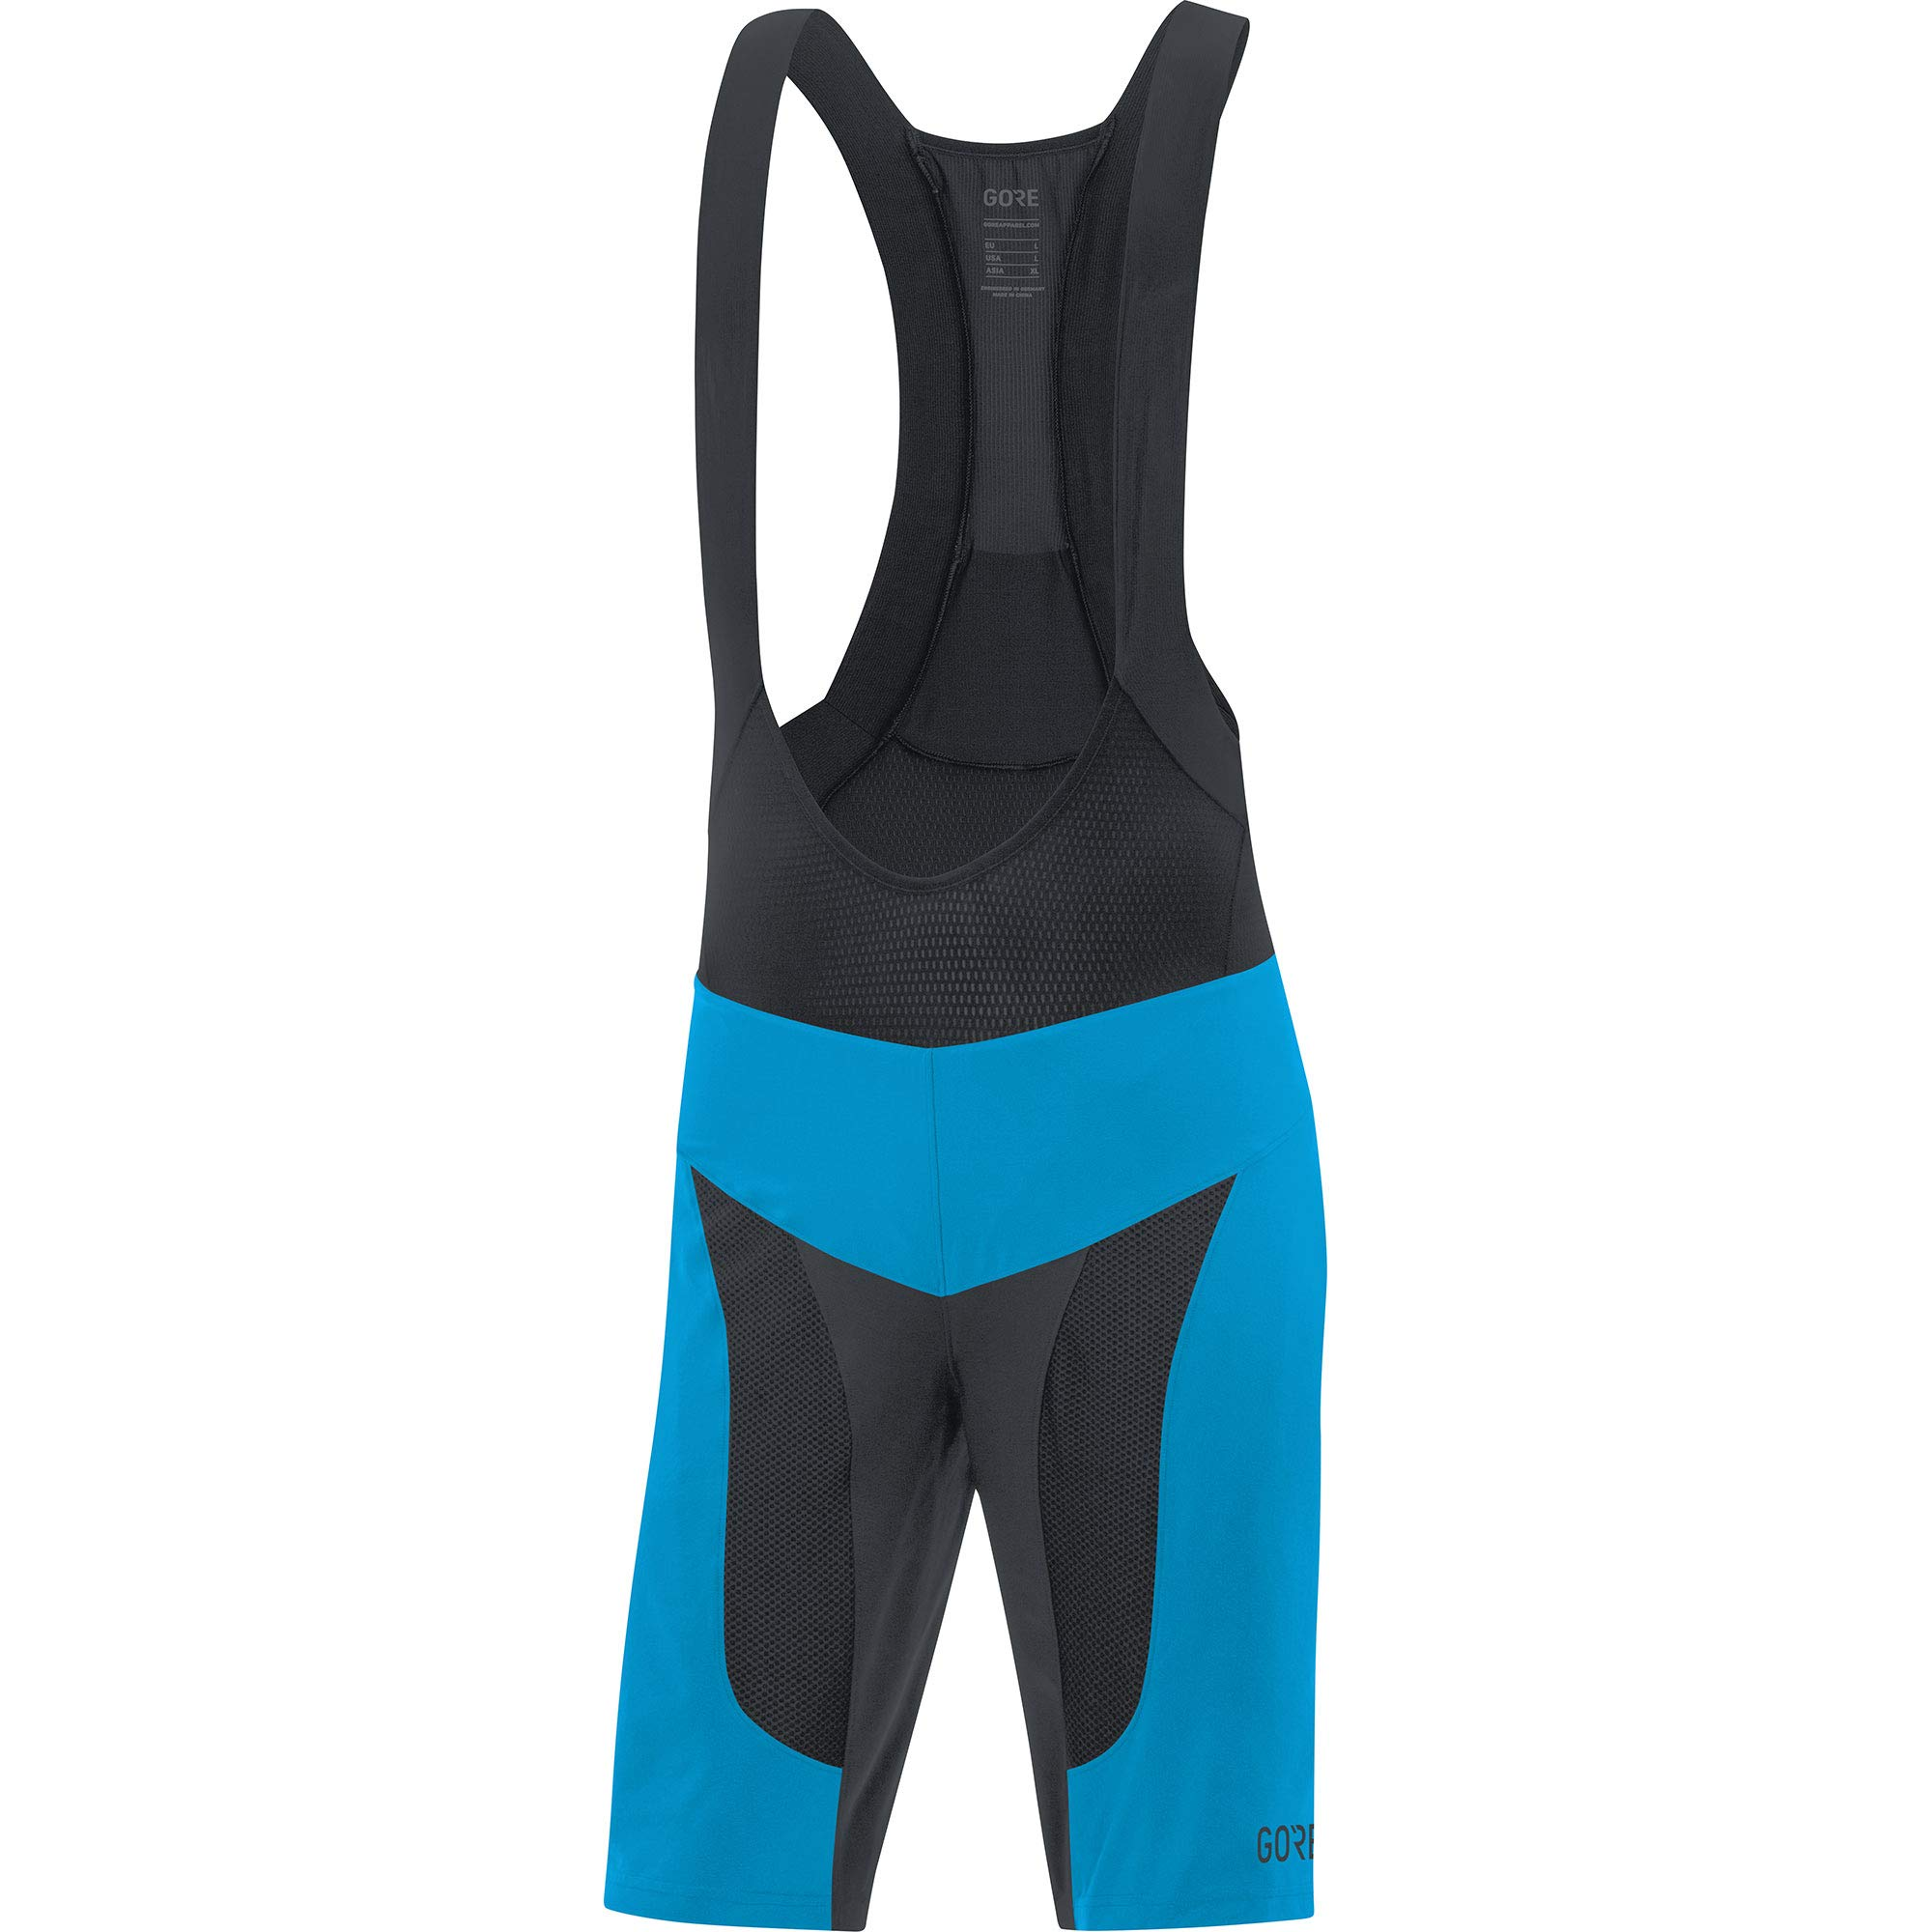 GORE Wear C7 2in1 Men's Mountain Cycling Bib Shorts With Seat Insert, M, Blue/Black